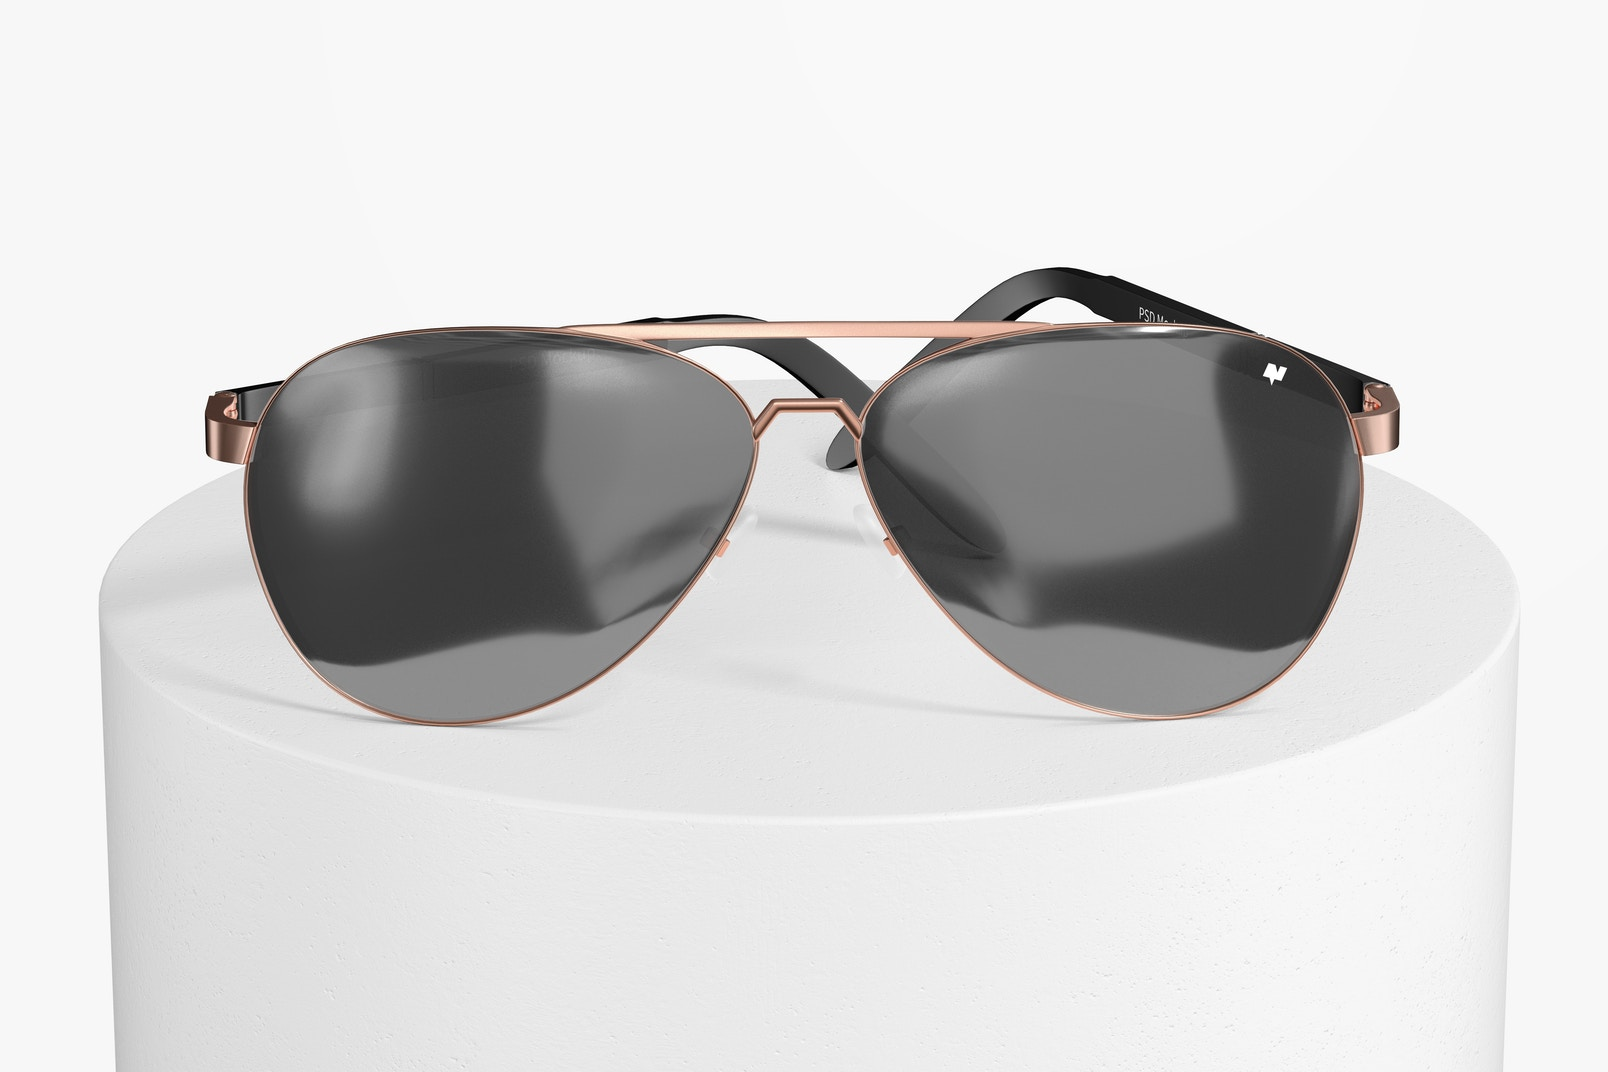 Aviator Sunglasses Mockup, Front View